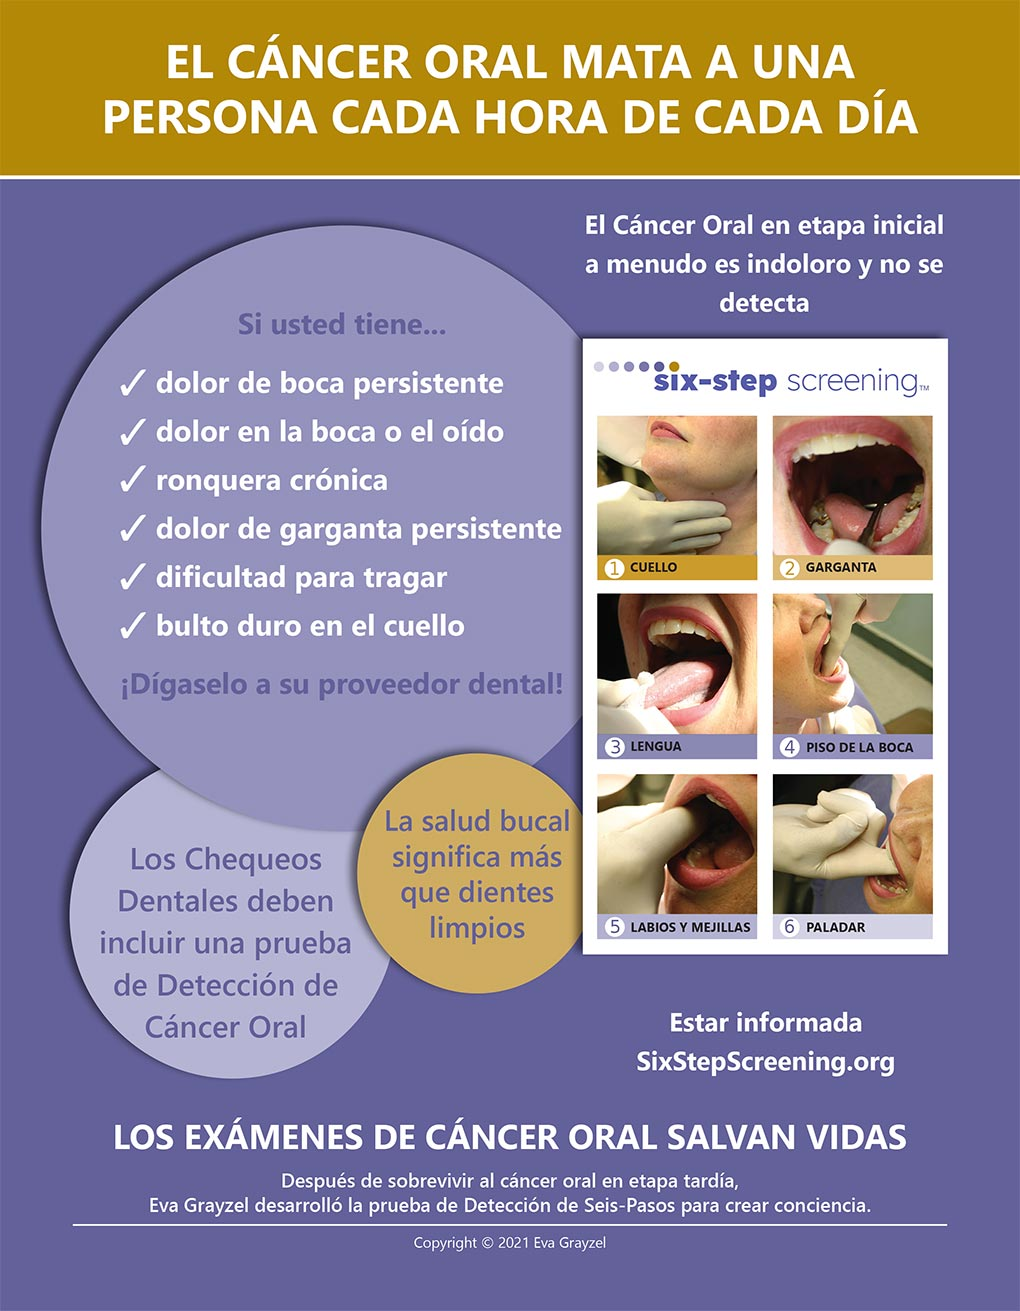 Six-Step Screening Poster 1-2-3 - Spanish (August 2021)